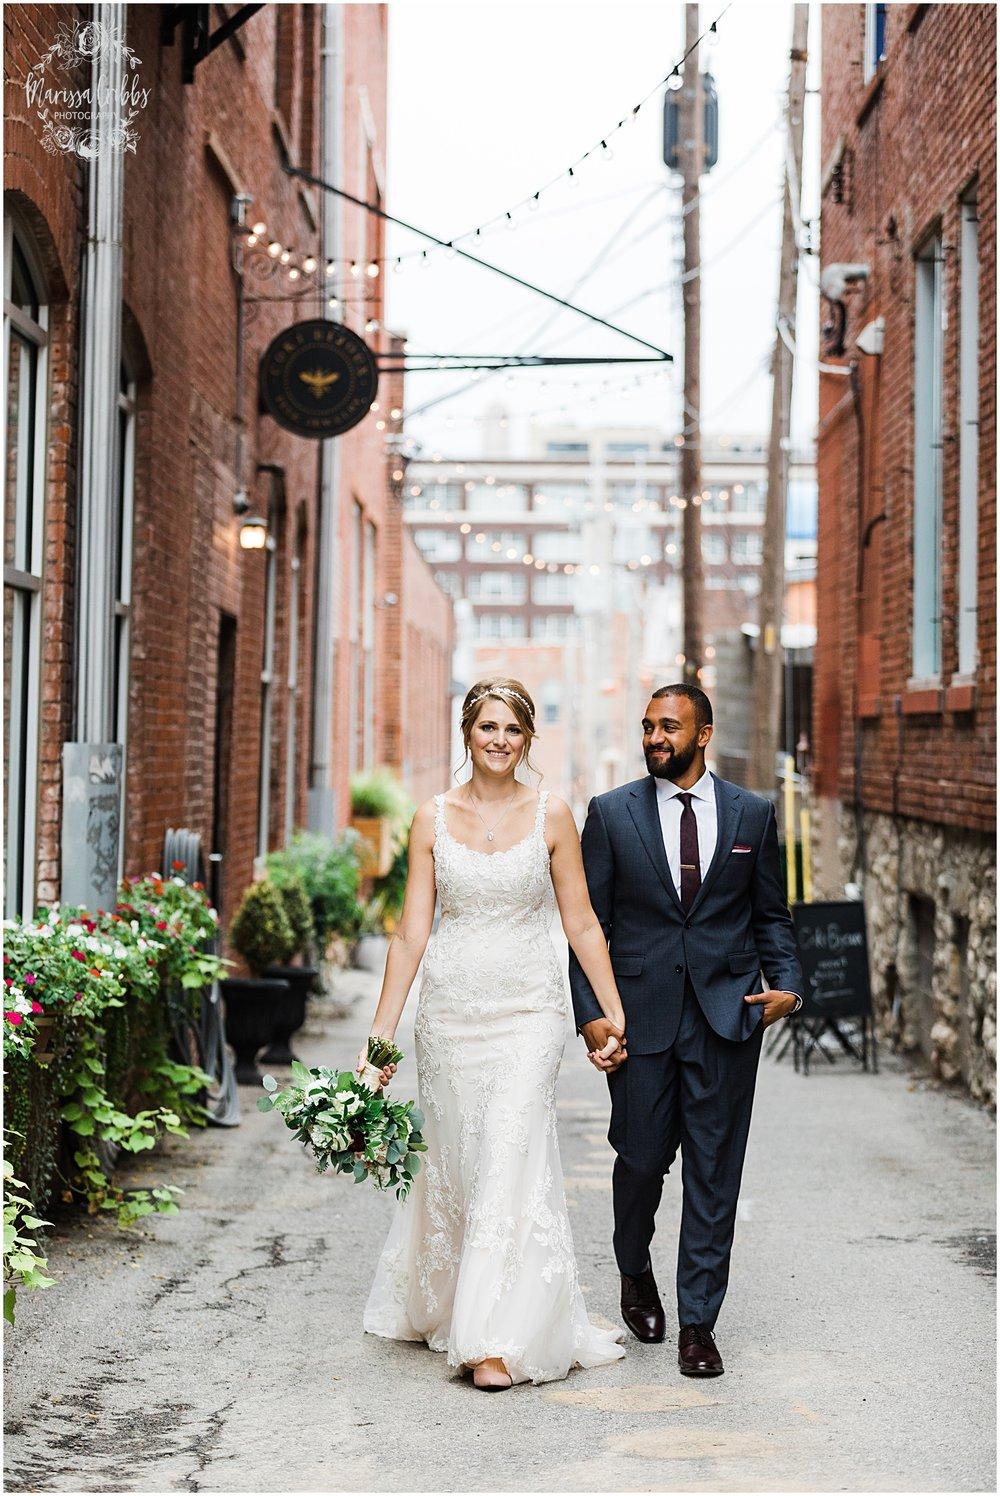 BAUER WEDDING | KELSEA & JUSTIN | MARISSA CRIBBS PHOTOGRAPHY_6565.jpg